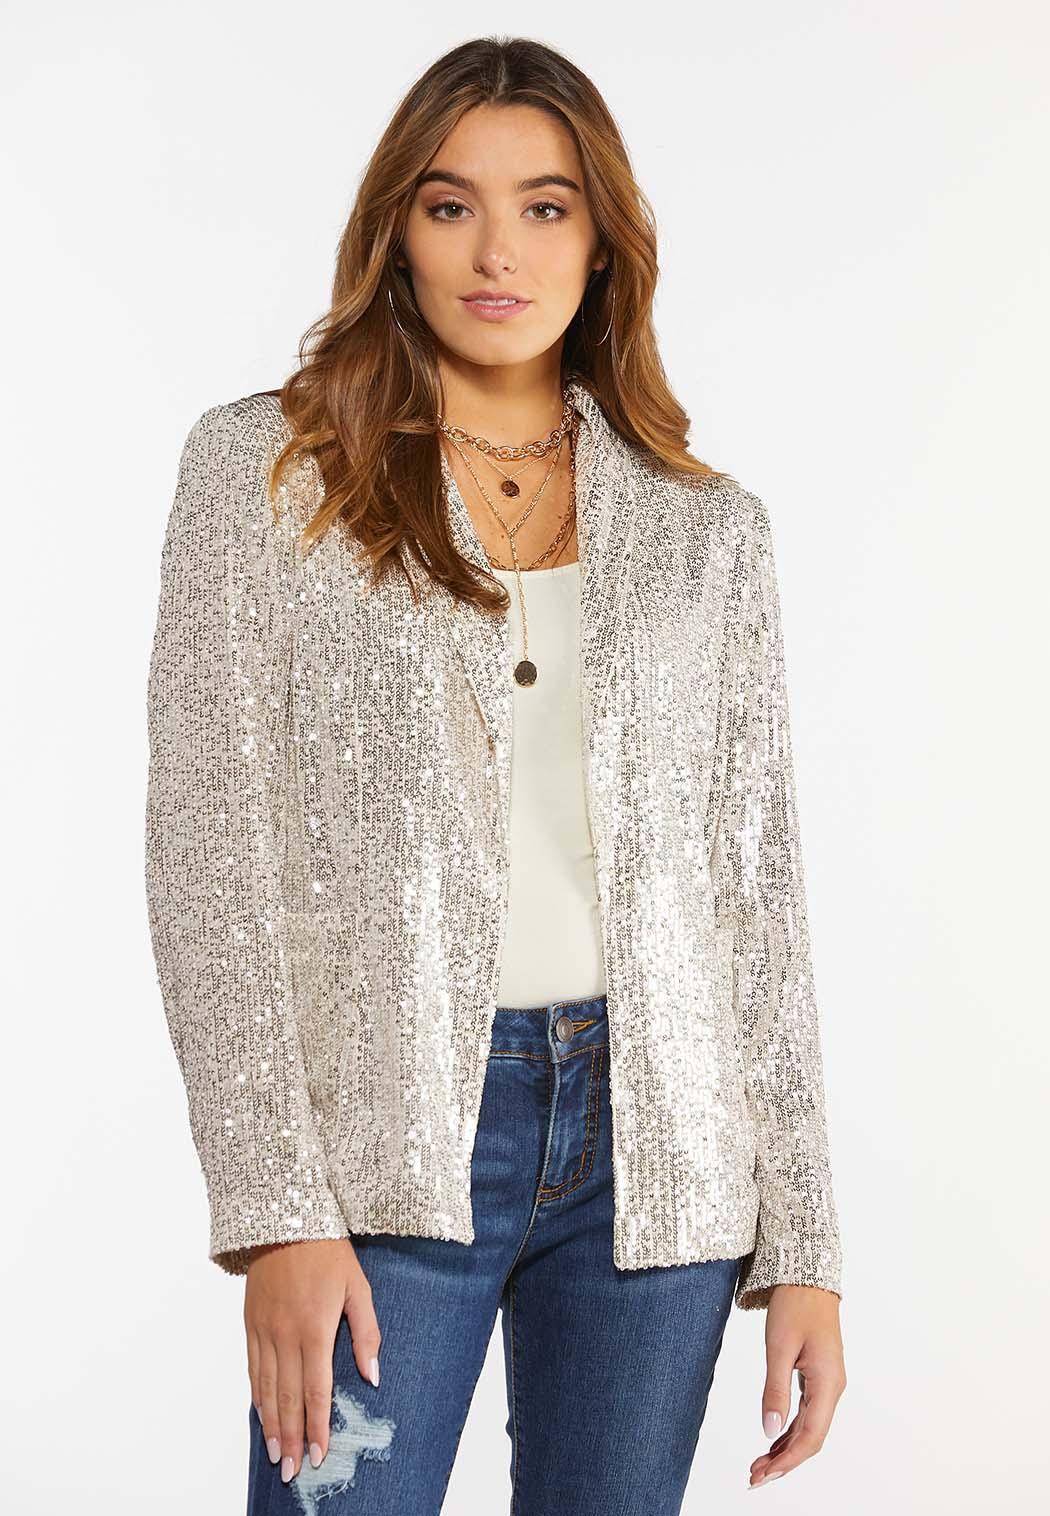 Champagne Sequin Jacket